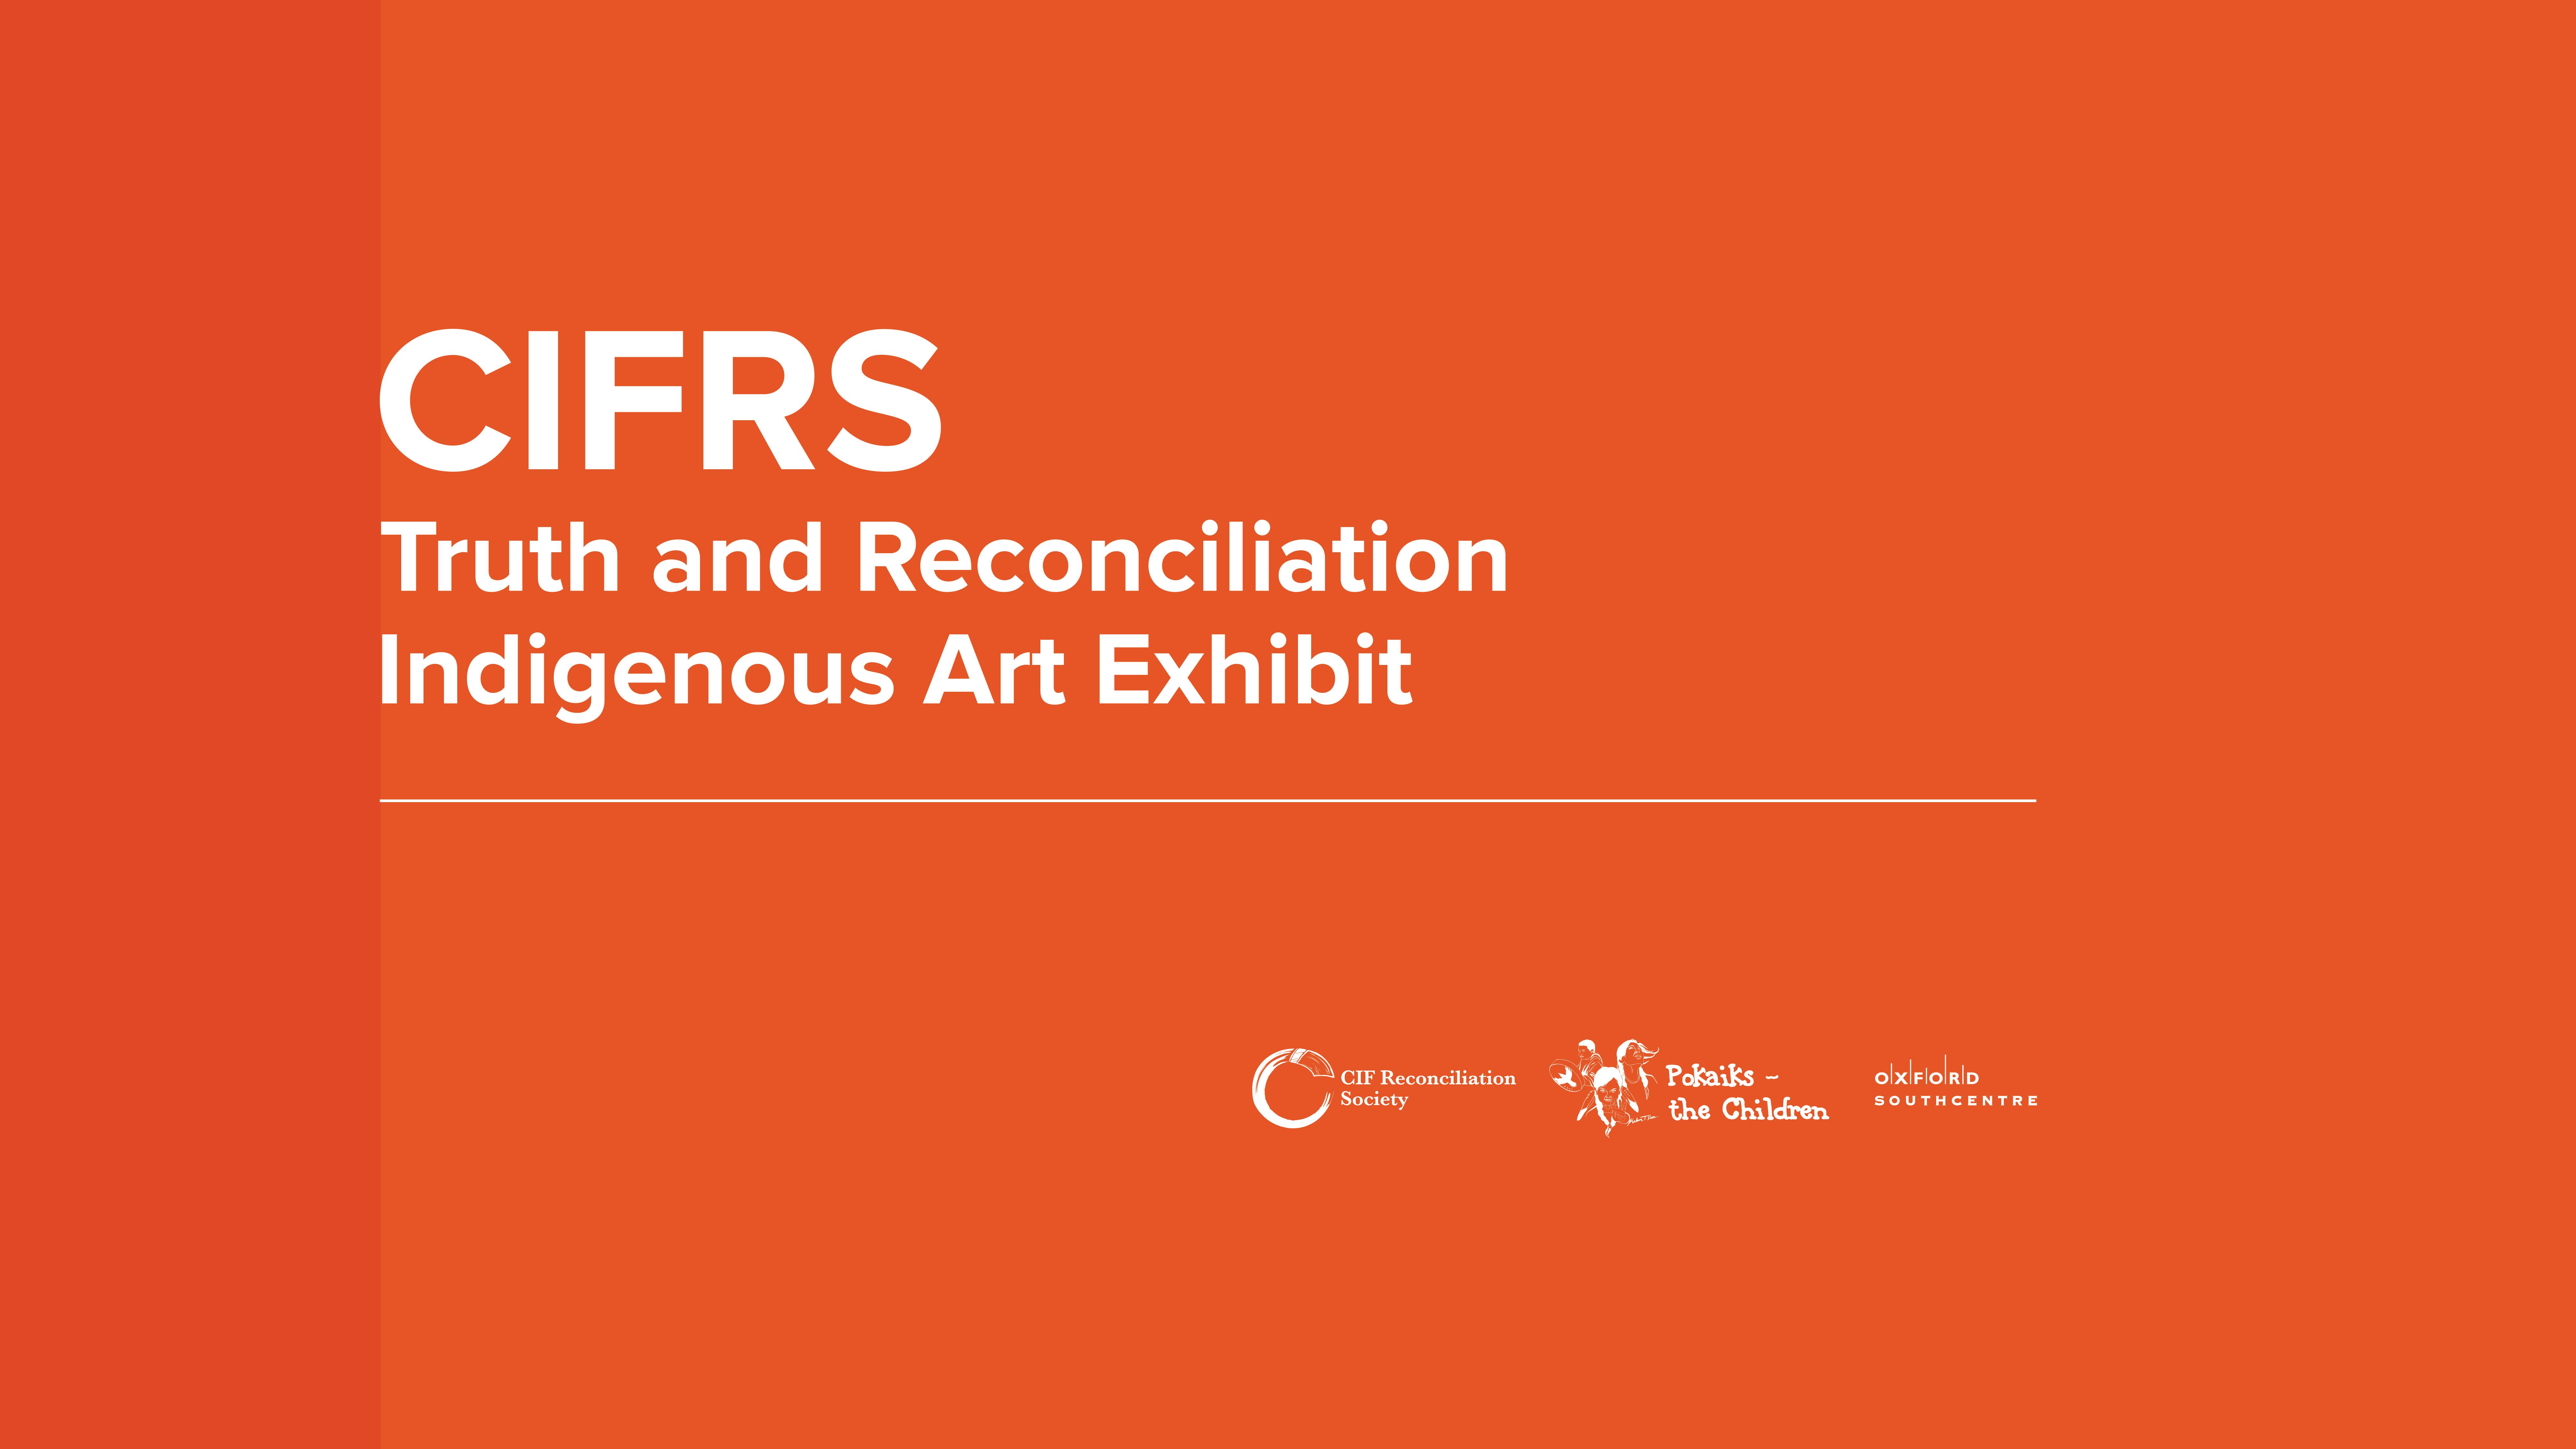 CIFRS Truth & Reconciliation Indigenous Art Exhibit